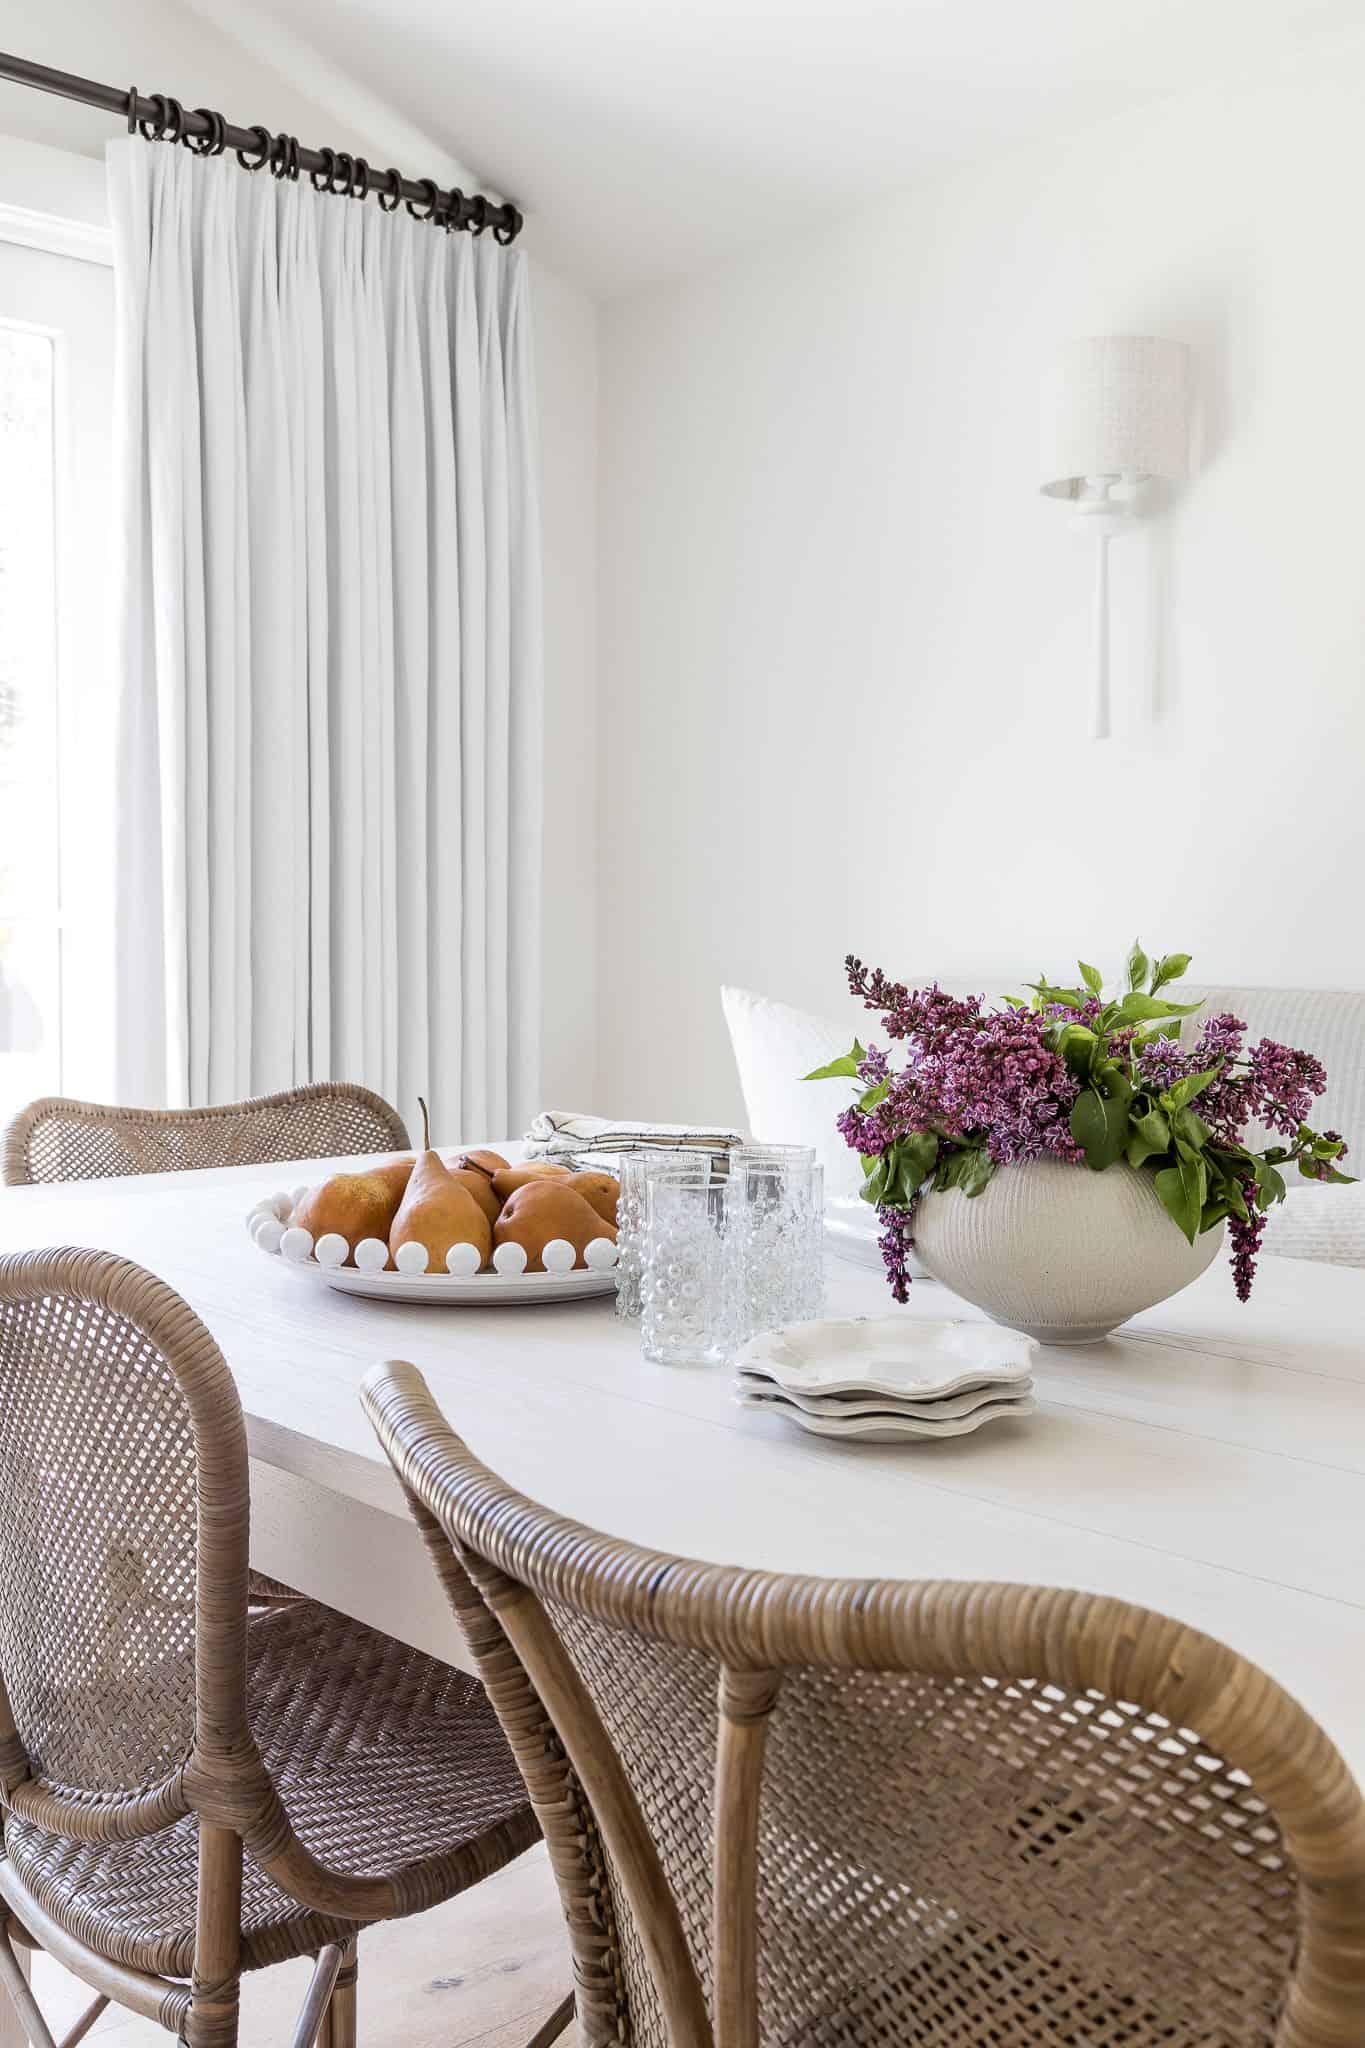 Port Newport Project - Mindy Gayer Design Co. - Dining Nook Design